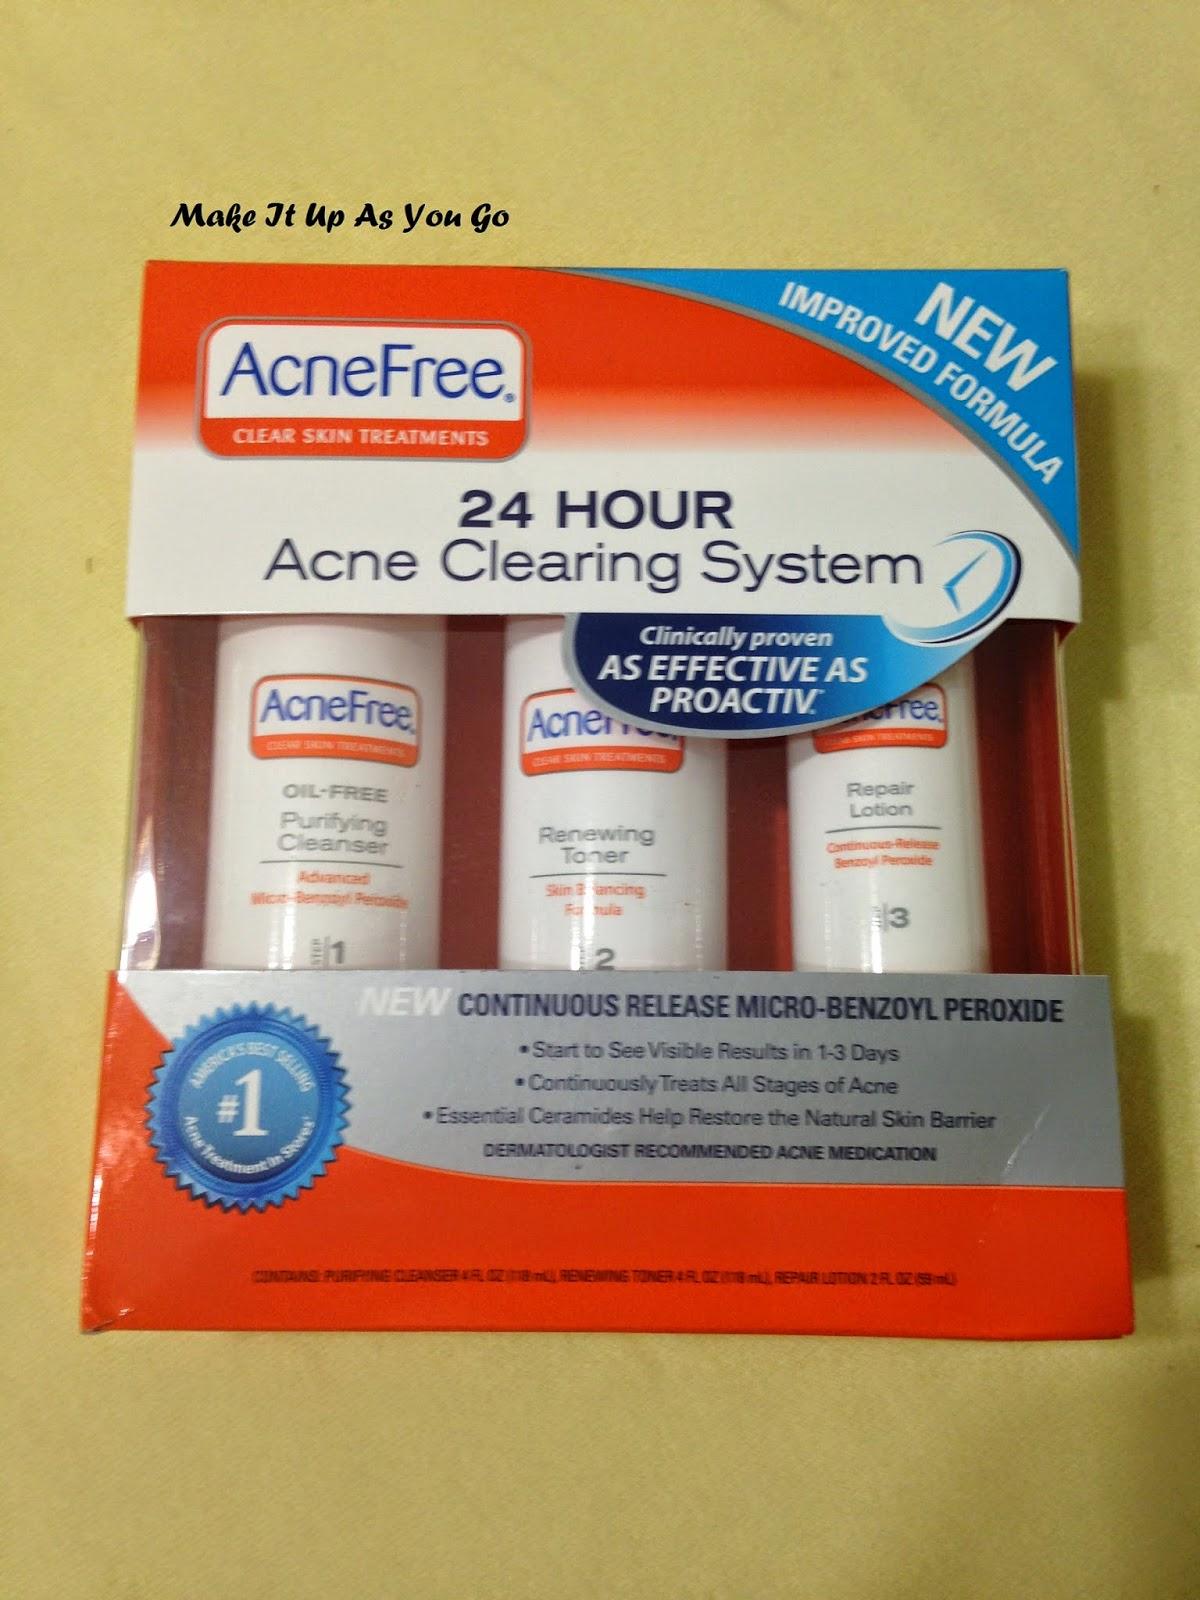 who makes acne free